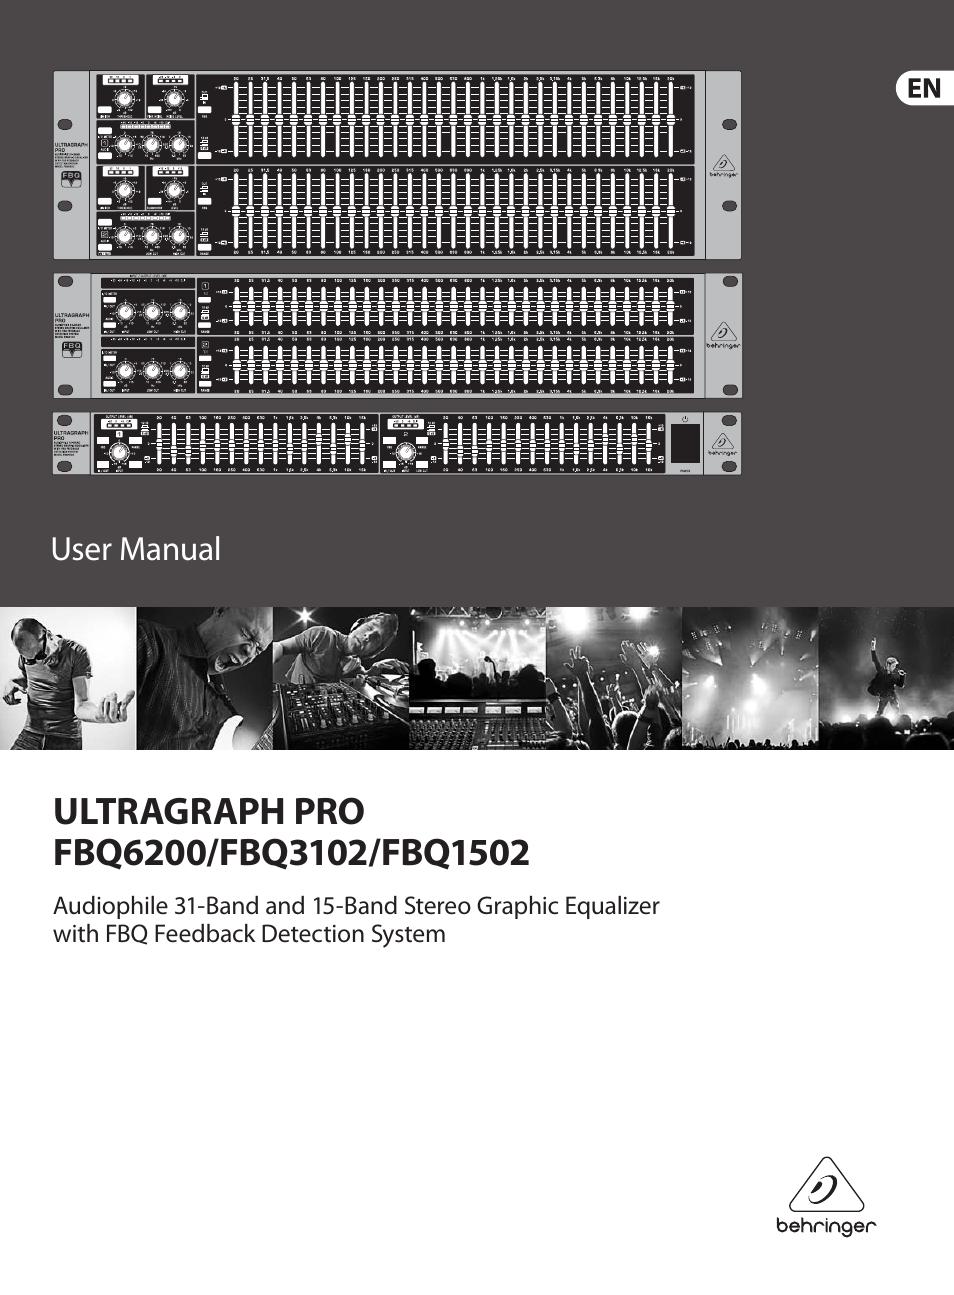 Behringer Fbq6200 Fbq3102 Fbq1502 User Manual 14 Pages 221510 Band Stereo Graphic Equaliser